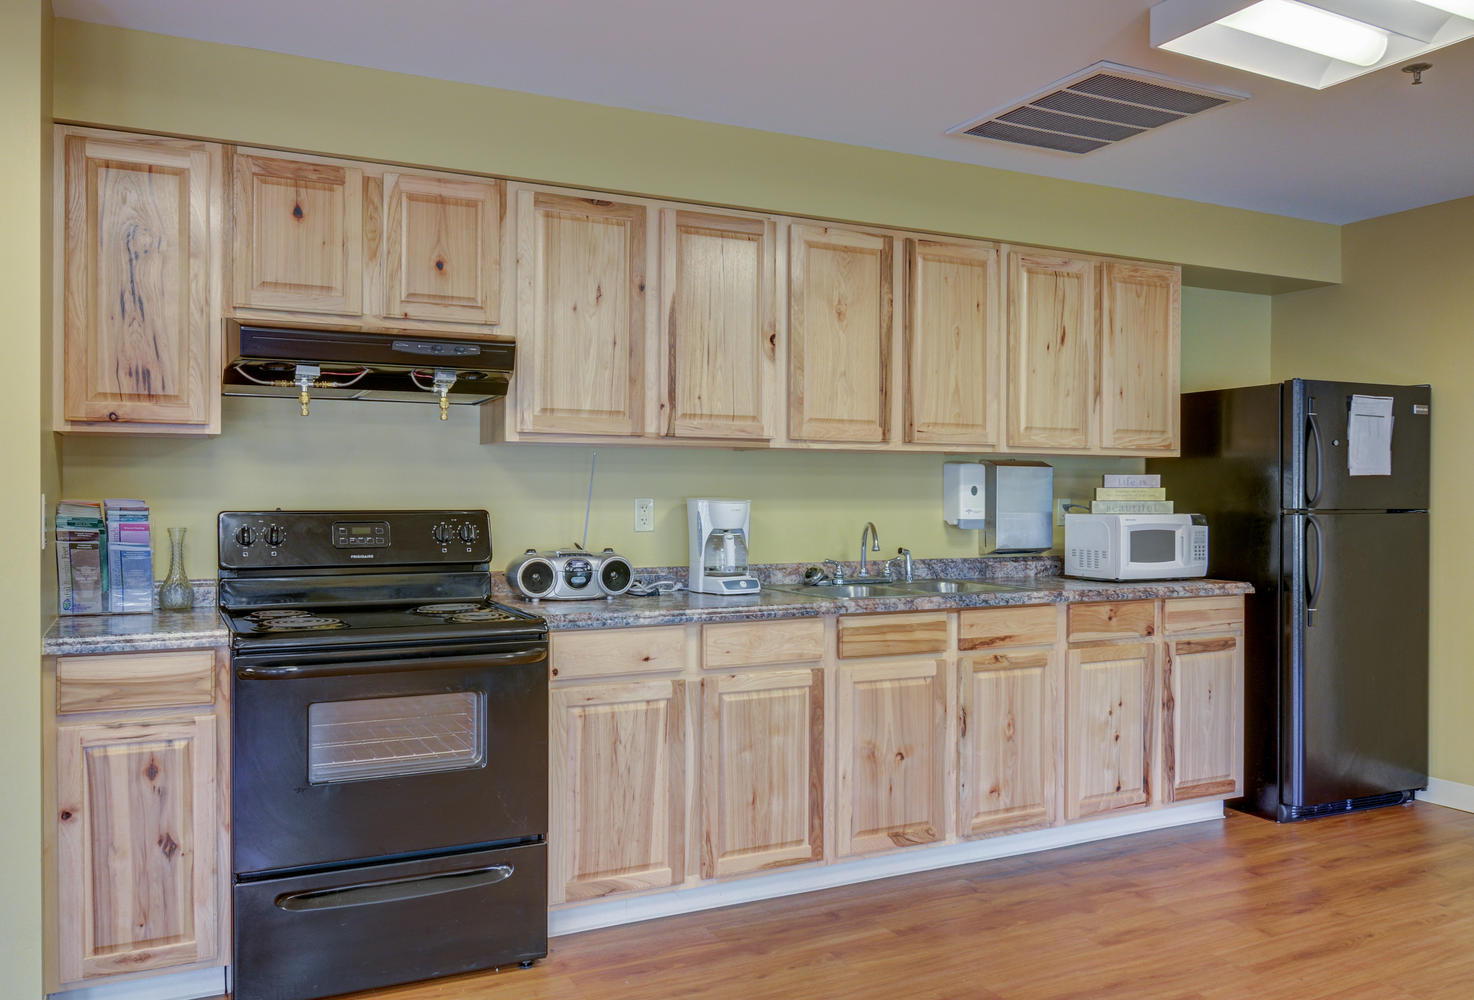 Kitchen area in Stonerise Lindside Rehabilitation room